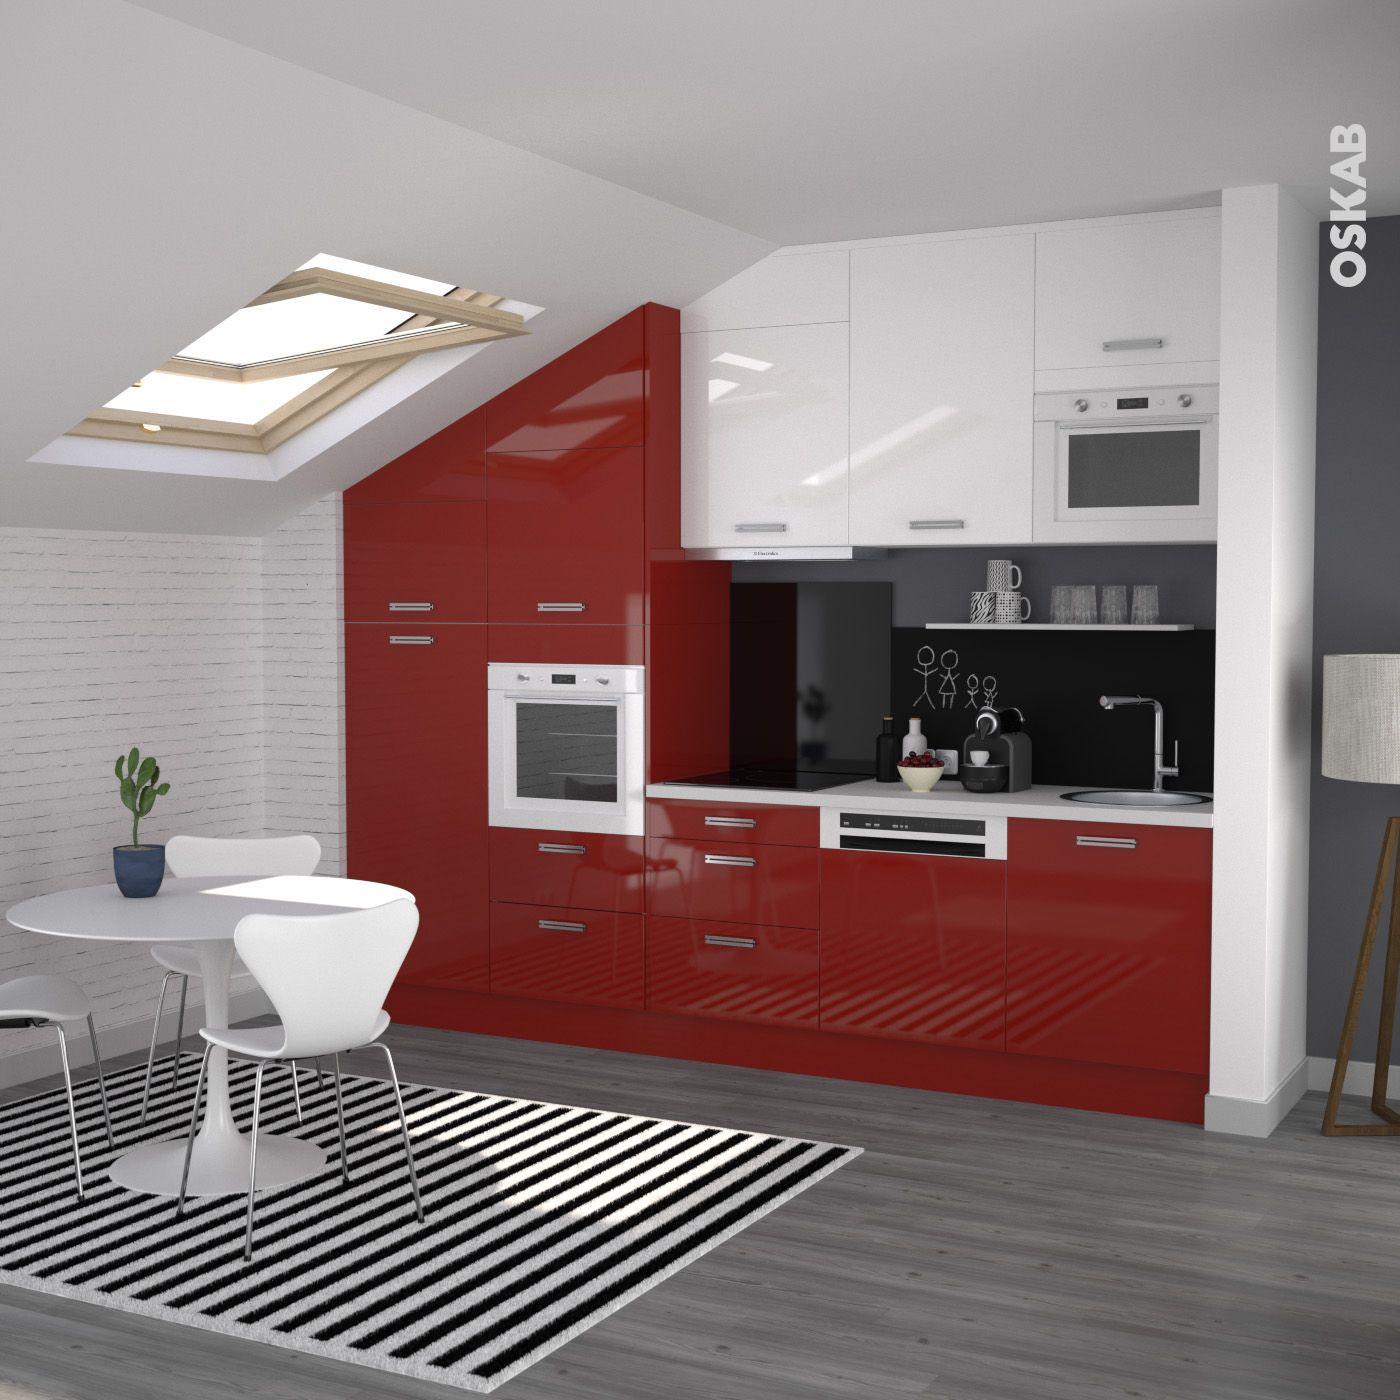 Cuisine rouge moderne façade STECIA Rouge brillant | cuisine rouge ...